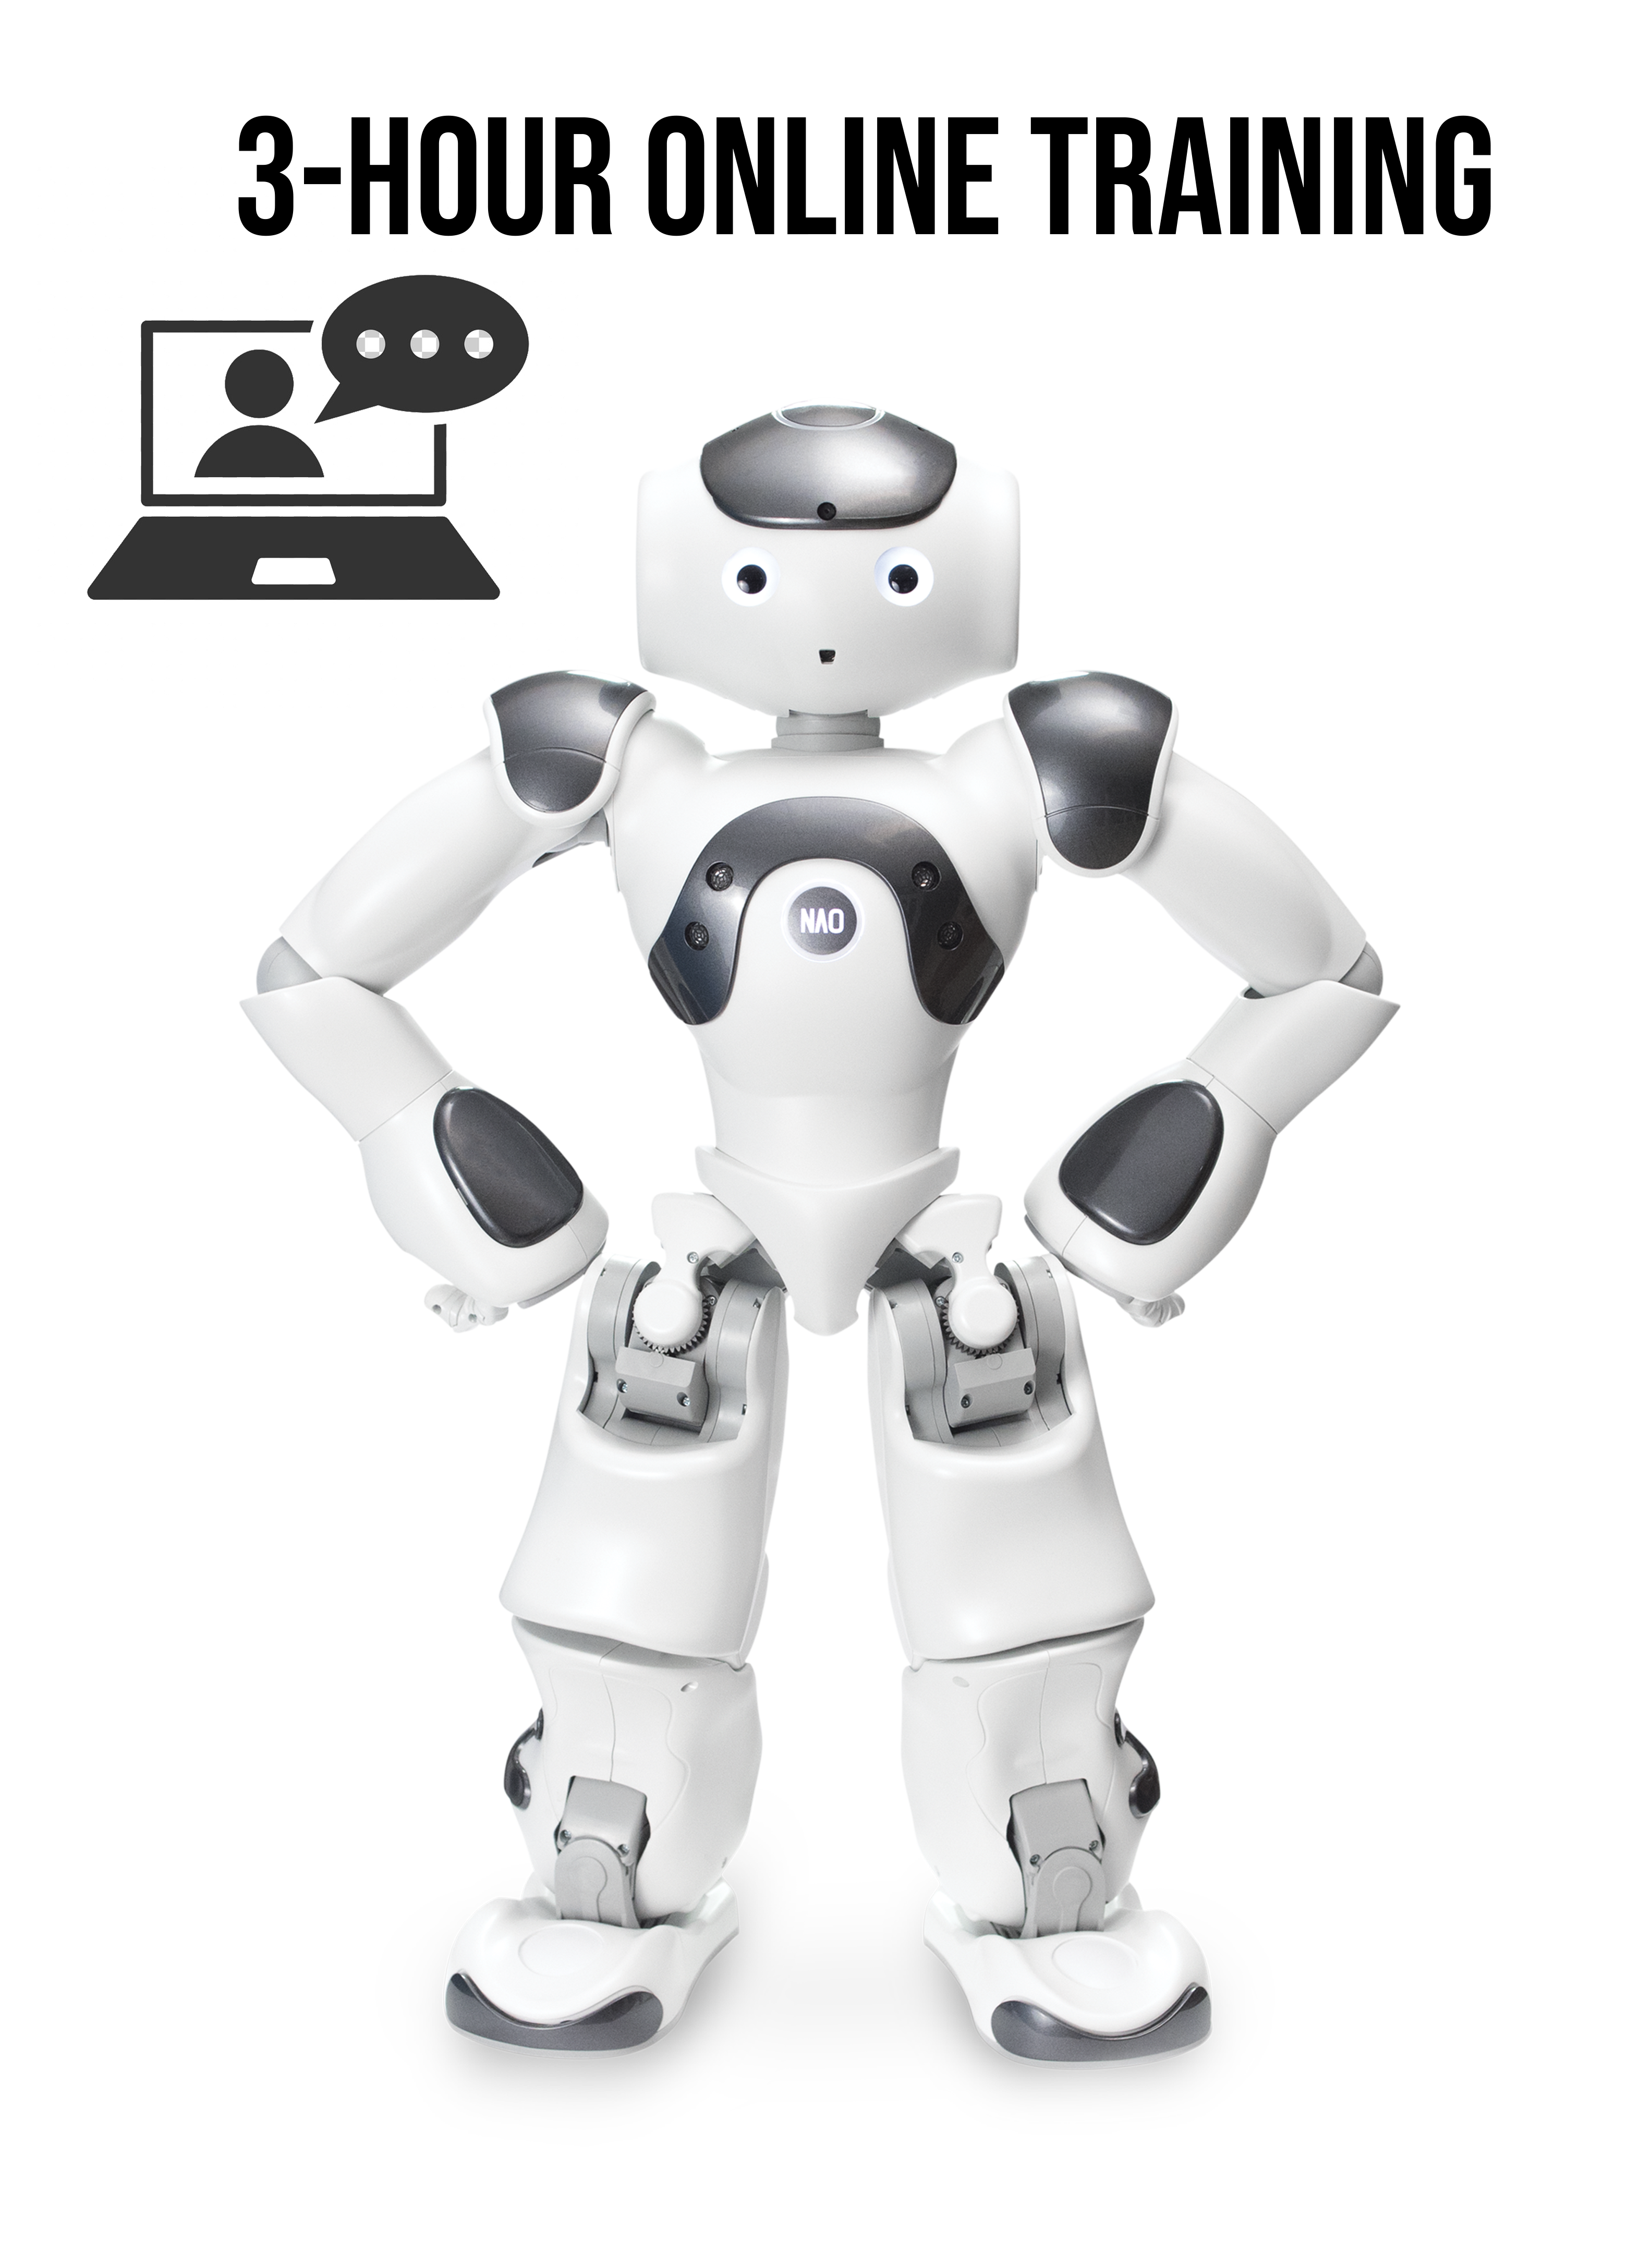 Nao-robot-3h-training